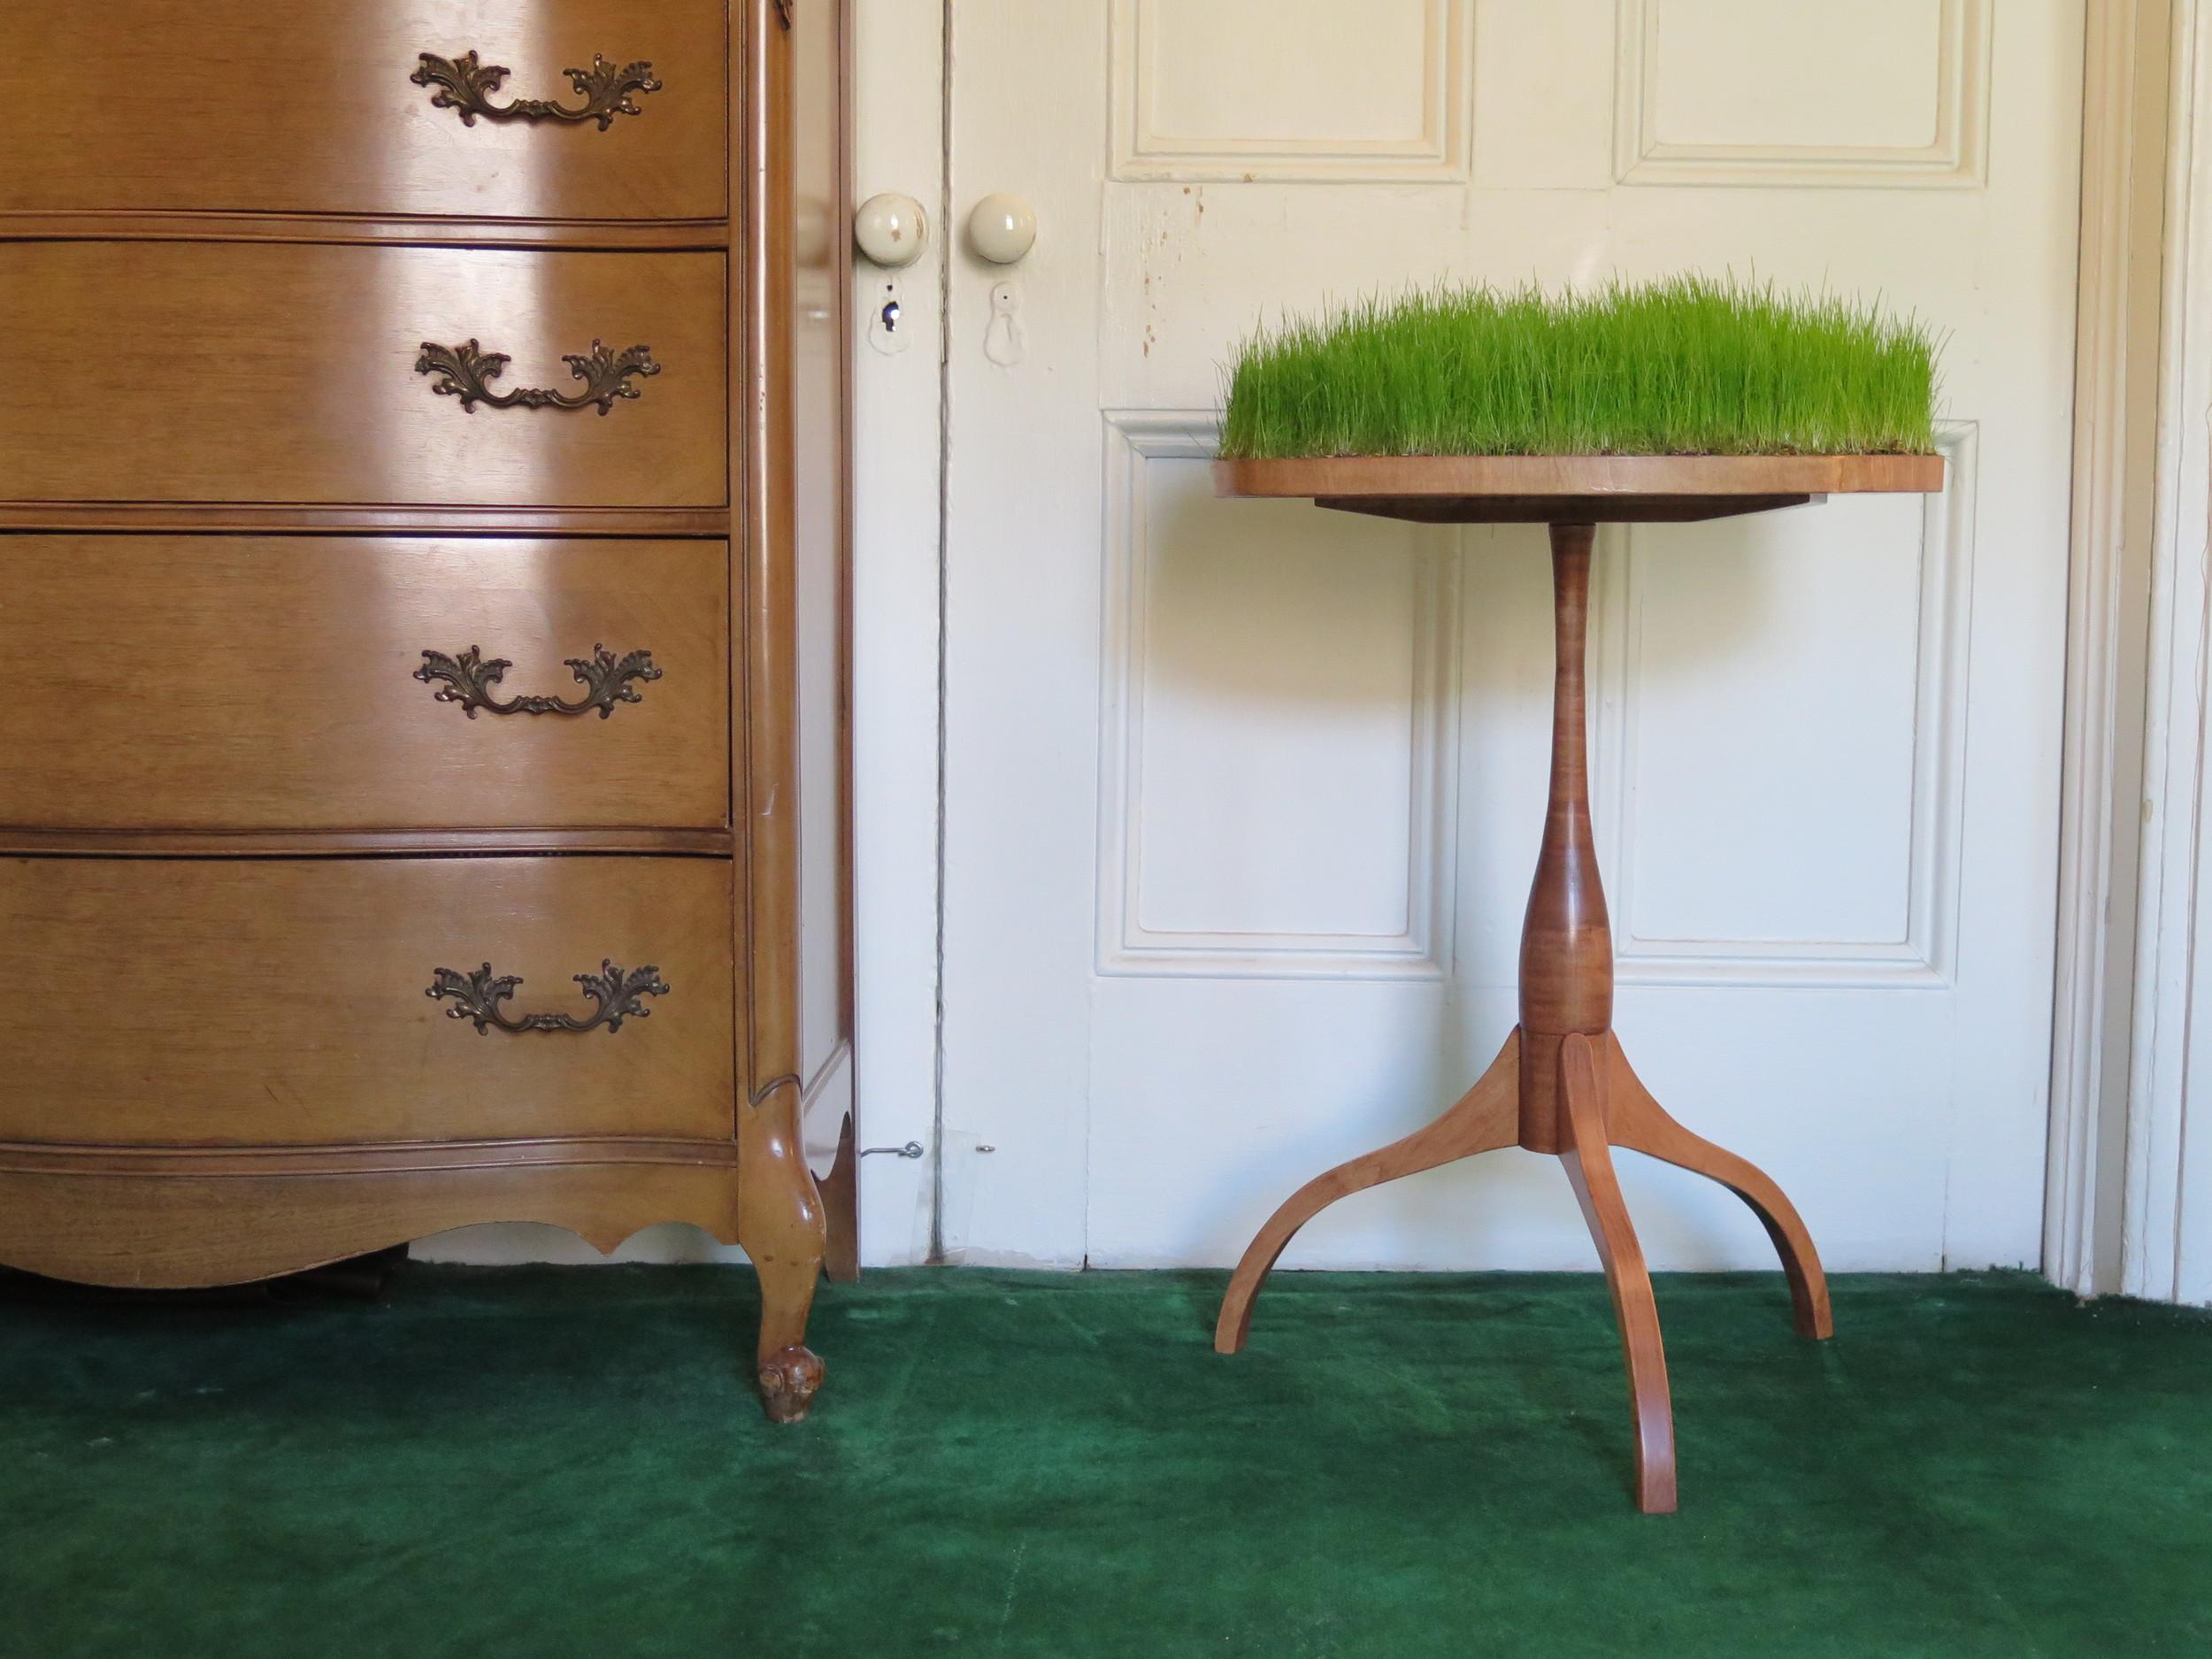 The Grass is Always Greener   by Yasunari Izaki